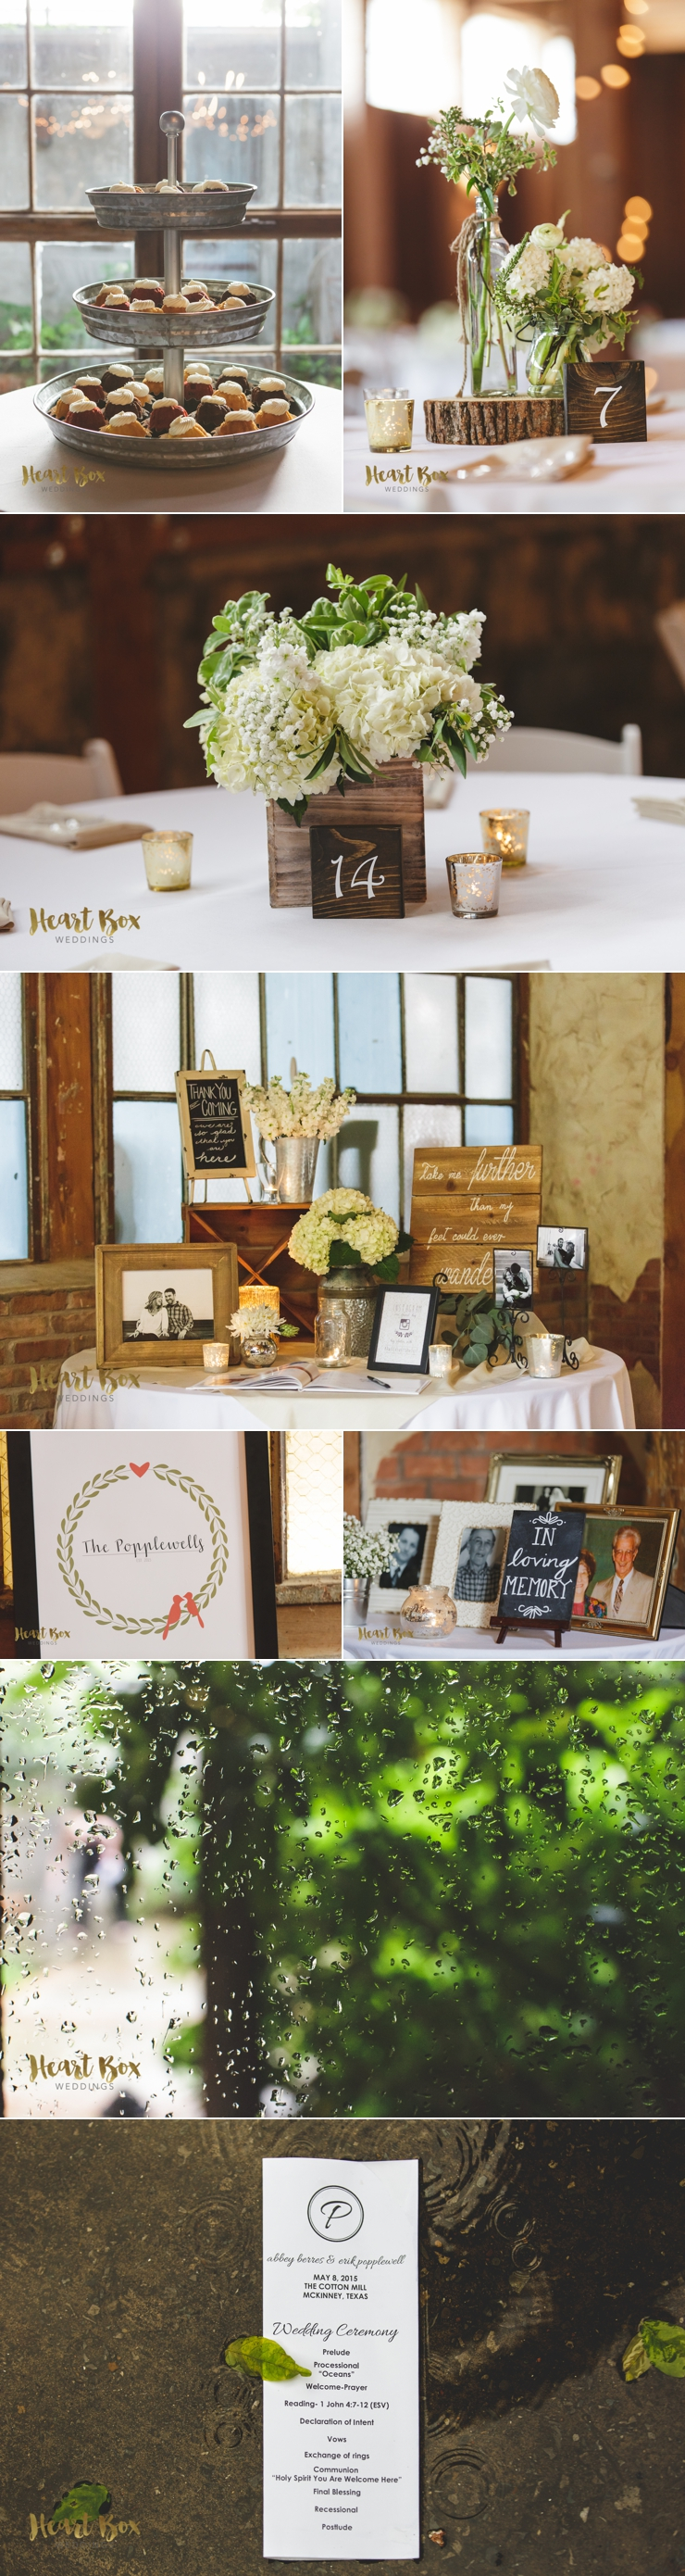 Popplewell Wedding Blog Collages 11.jpg